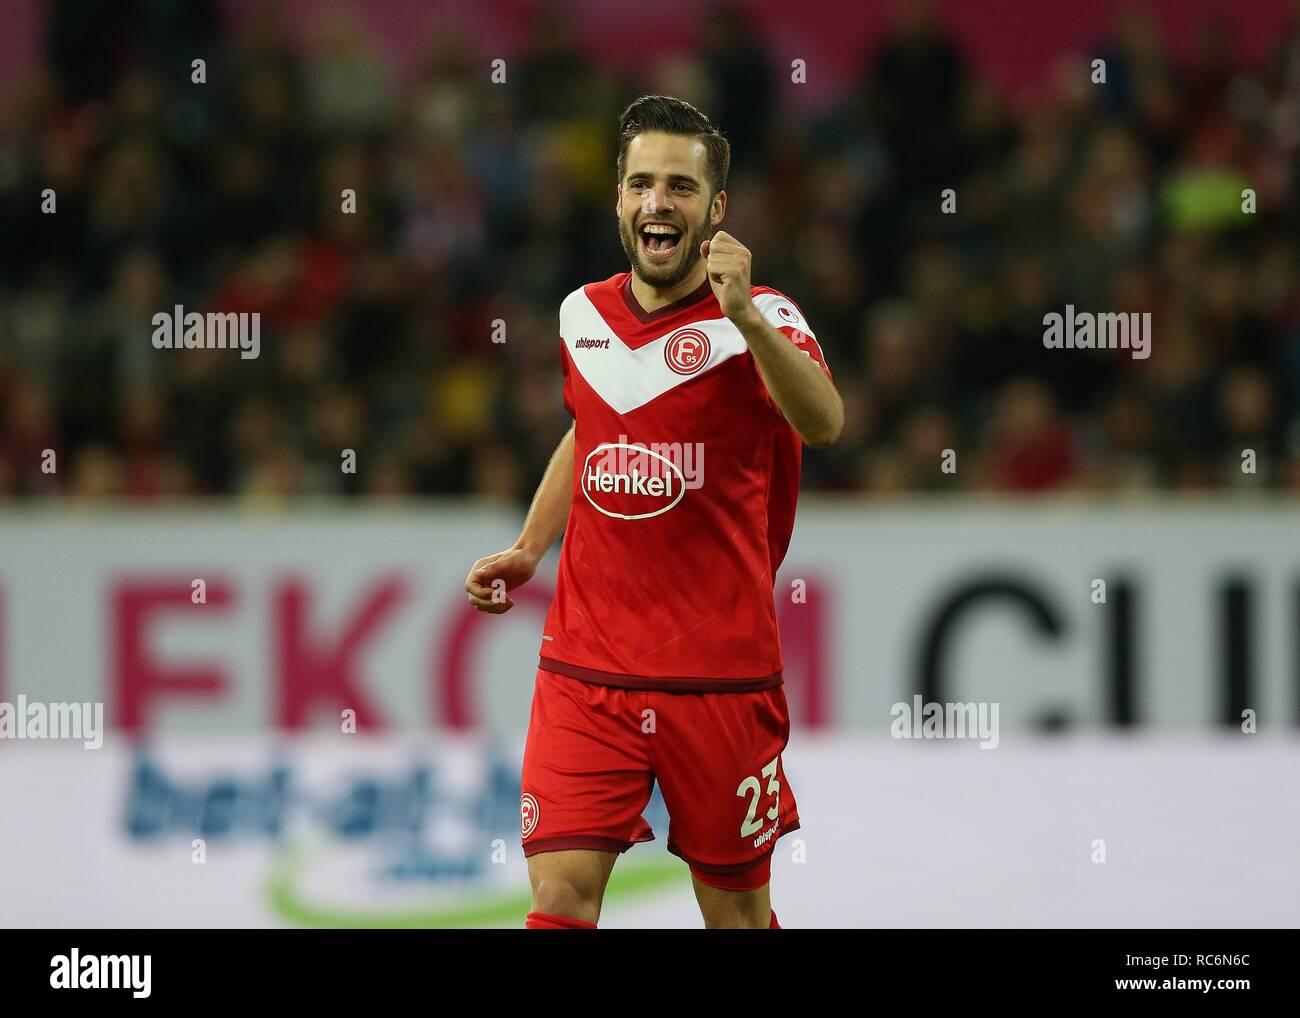 firo: 13.01.2019, football, 1.Bundesliga, season 2018/2019, Telekom-Cup 2019, Fortuna Dusseldorf, jubilation Niko GIEssELMANN   usage worldwide - Stock Image